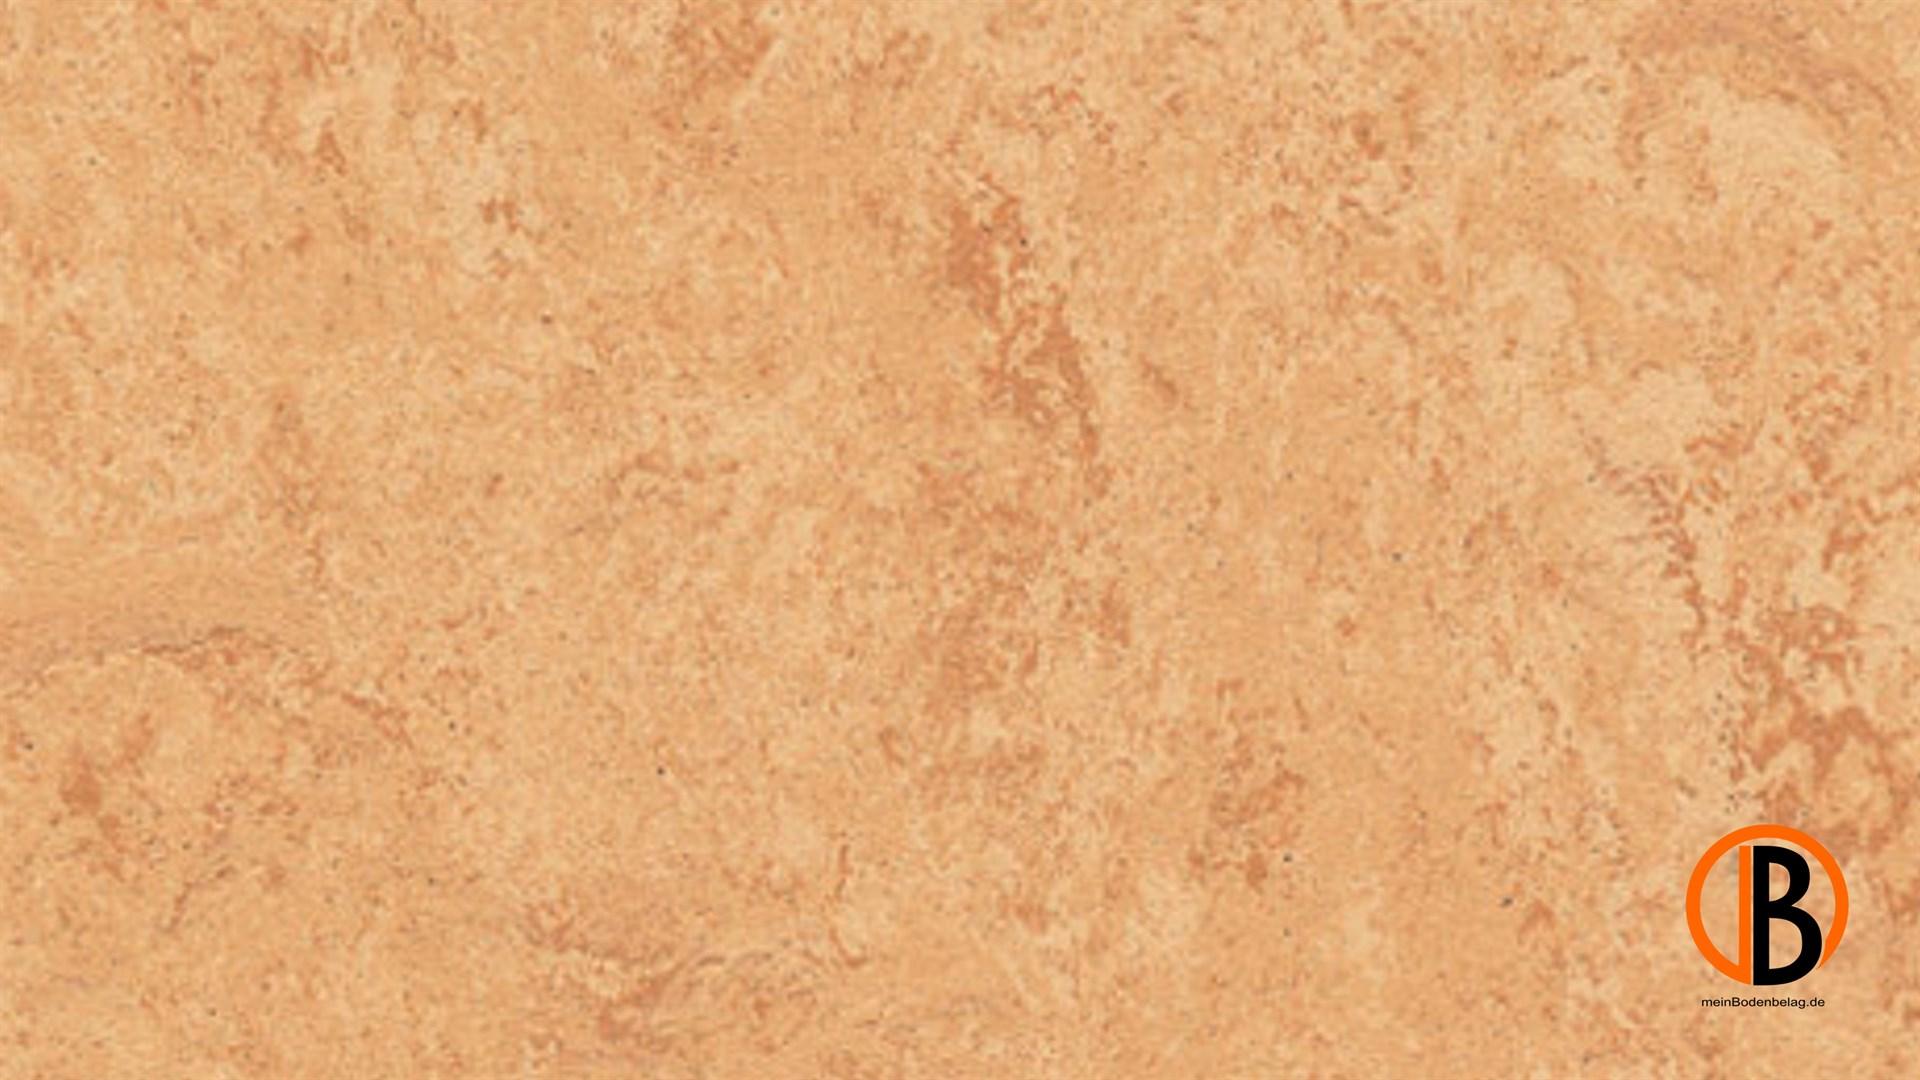 Kwg linoleum fertigparkett picolino peach - Linoleum holzdekor ...